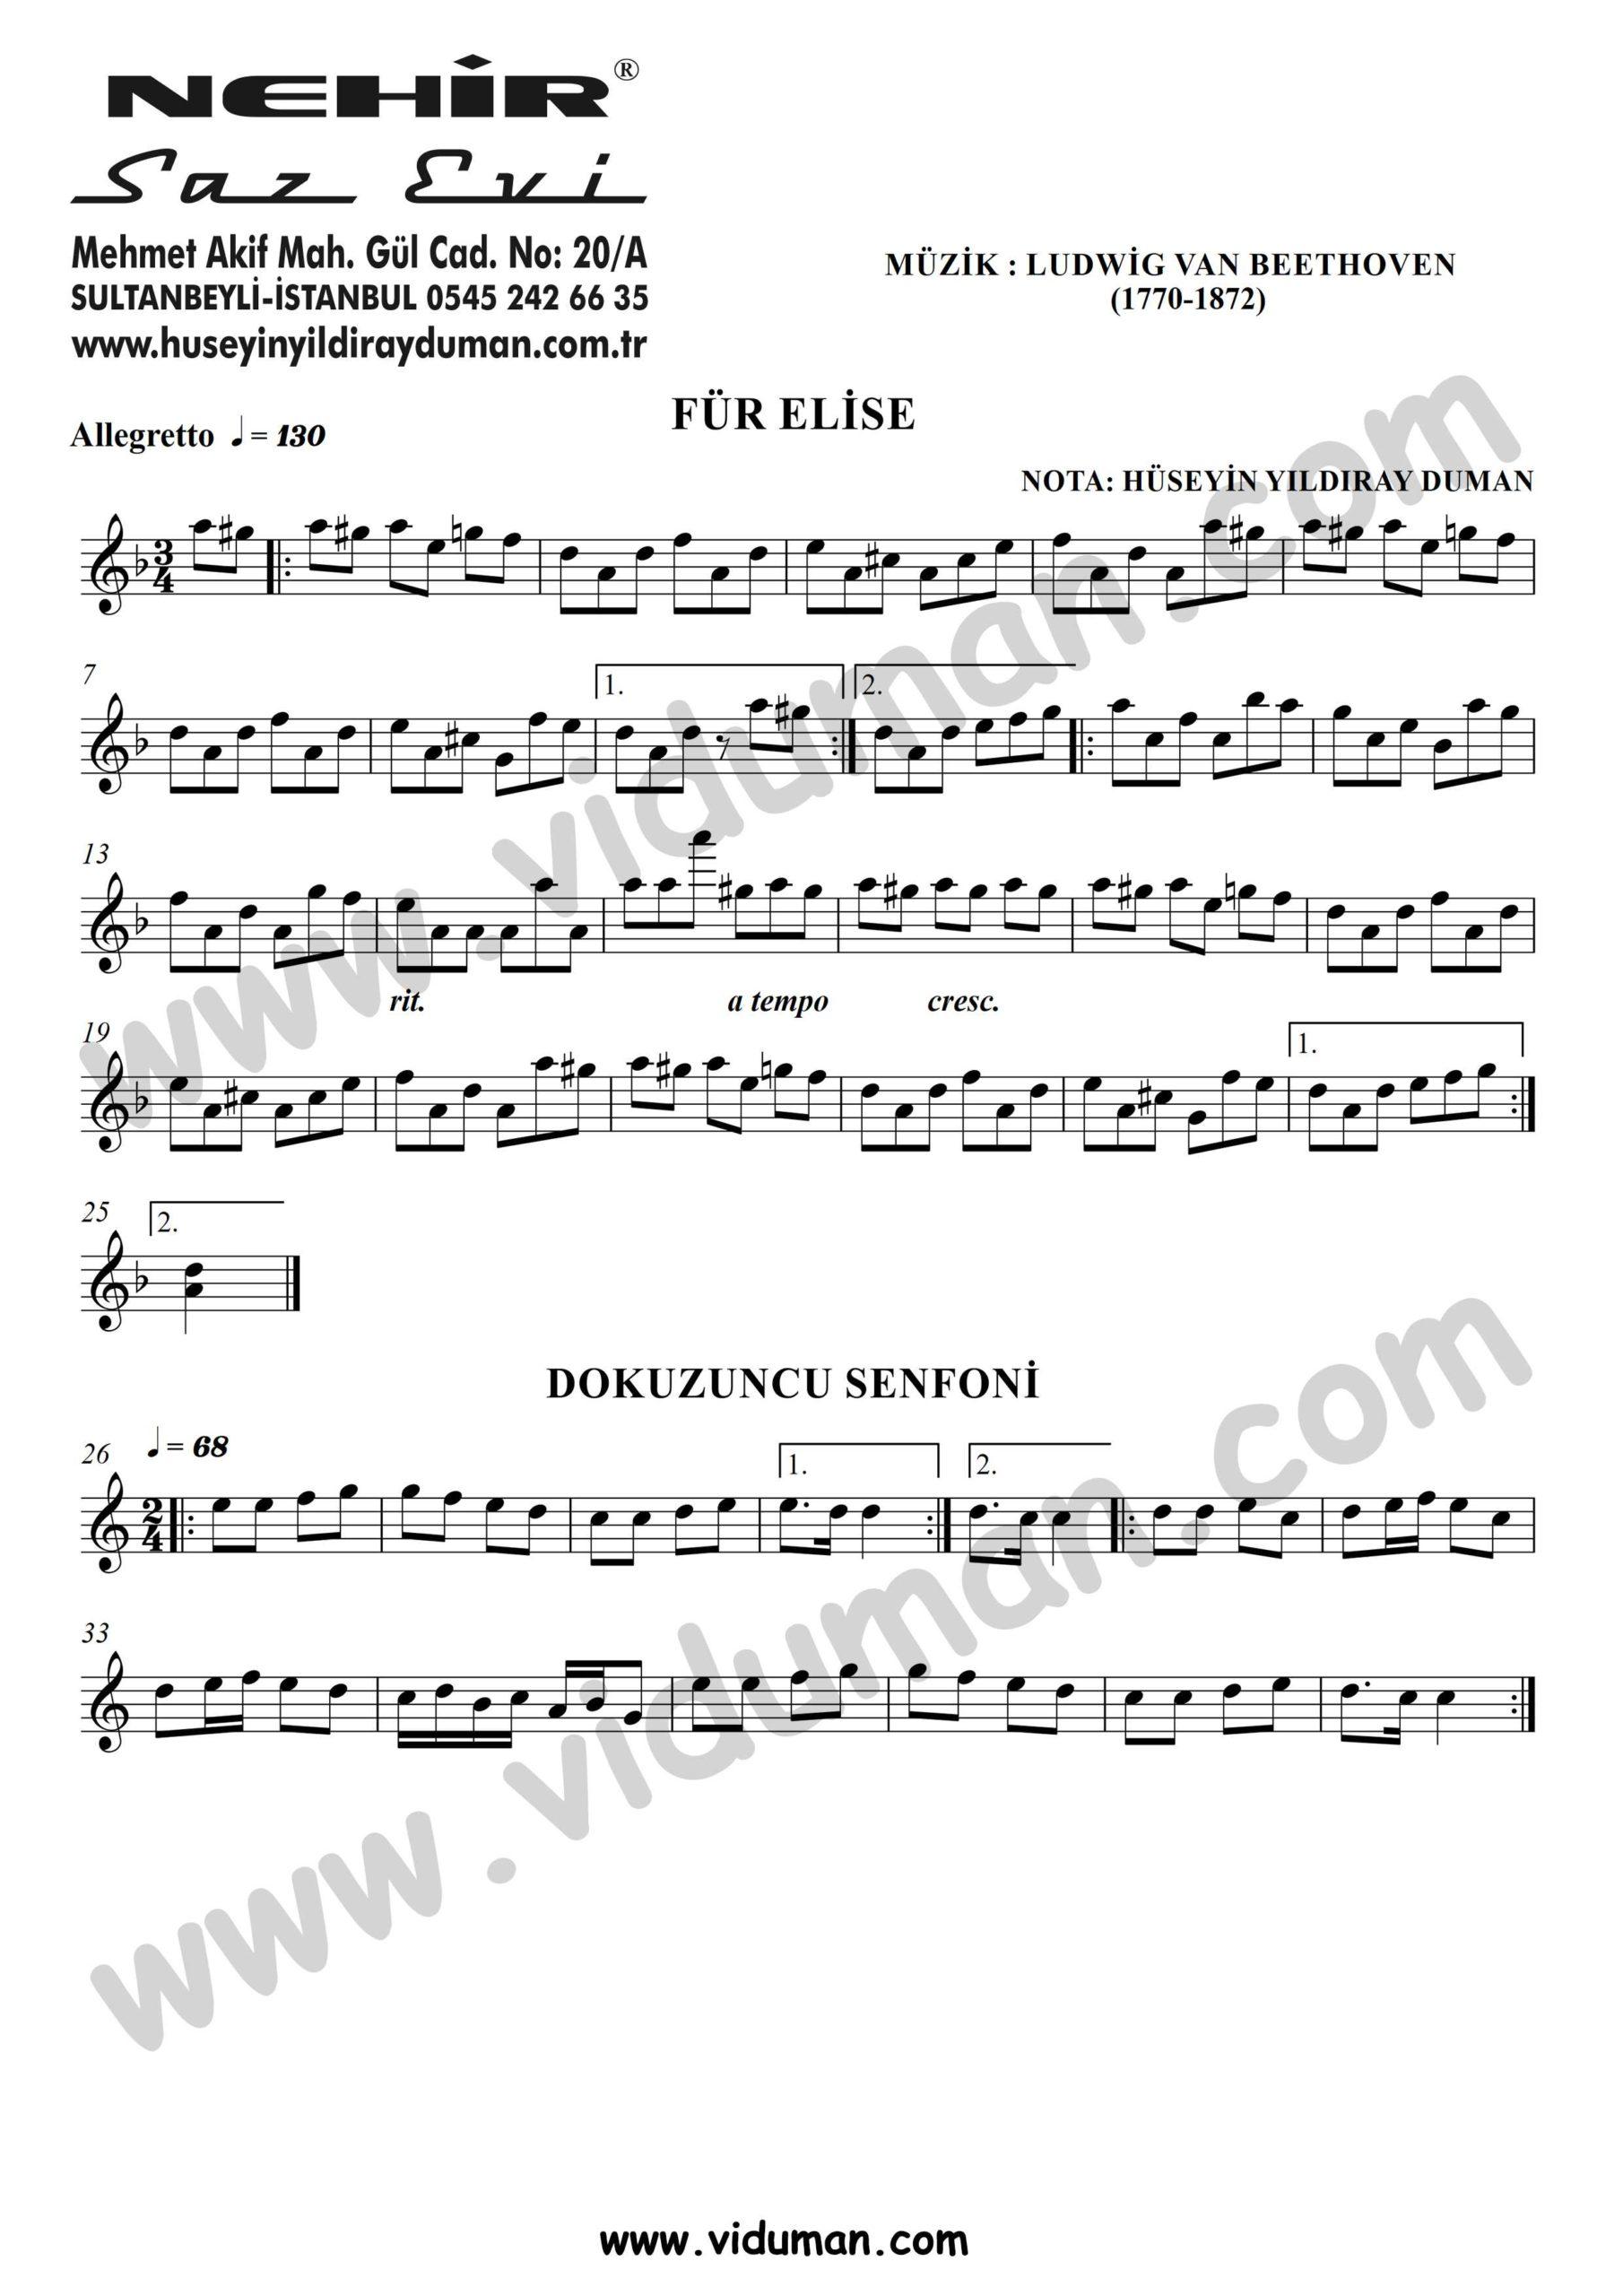 Fur Elise - 9. Senfoni